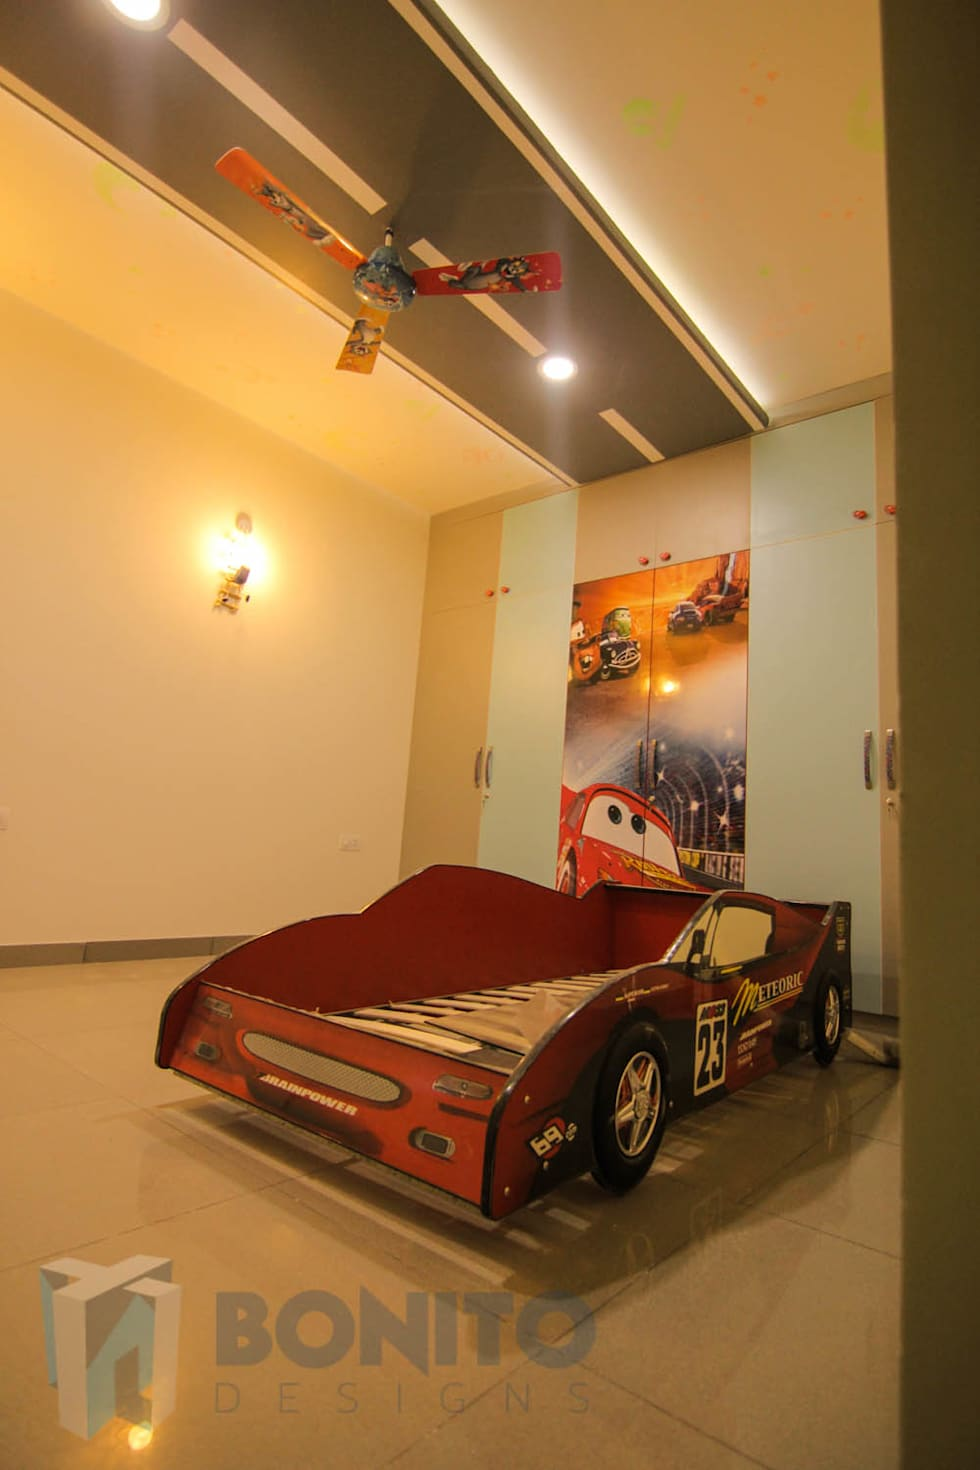 Modern False Ceiling Designs For Bedrooms Modern Bedroom Photos Car Based Cot And Road Based False Ceiling